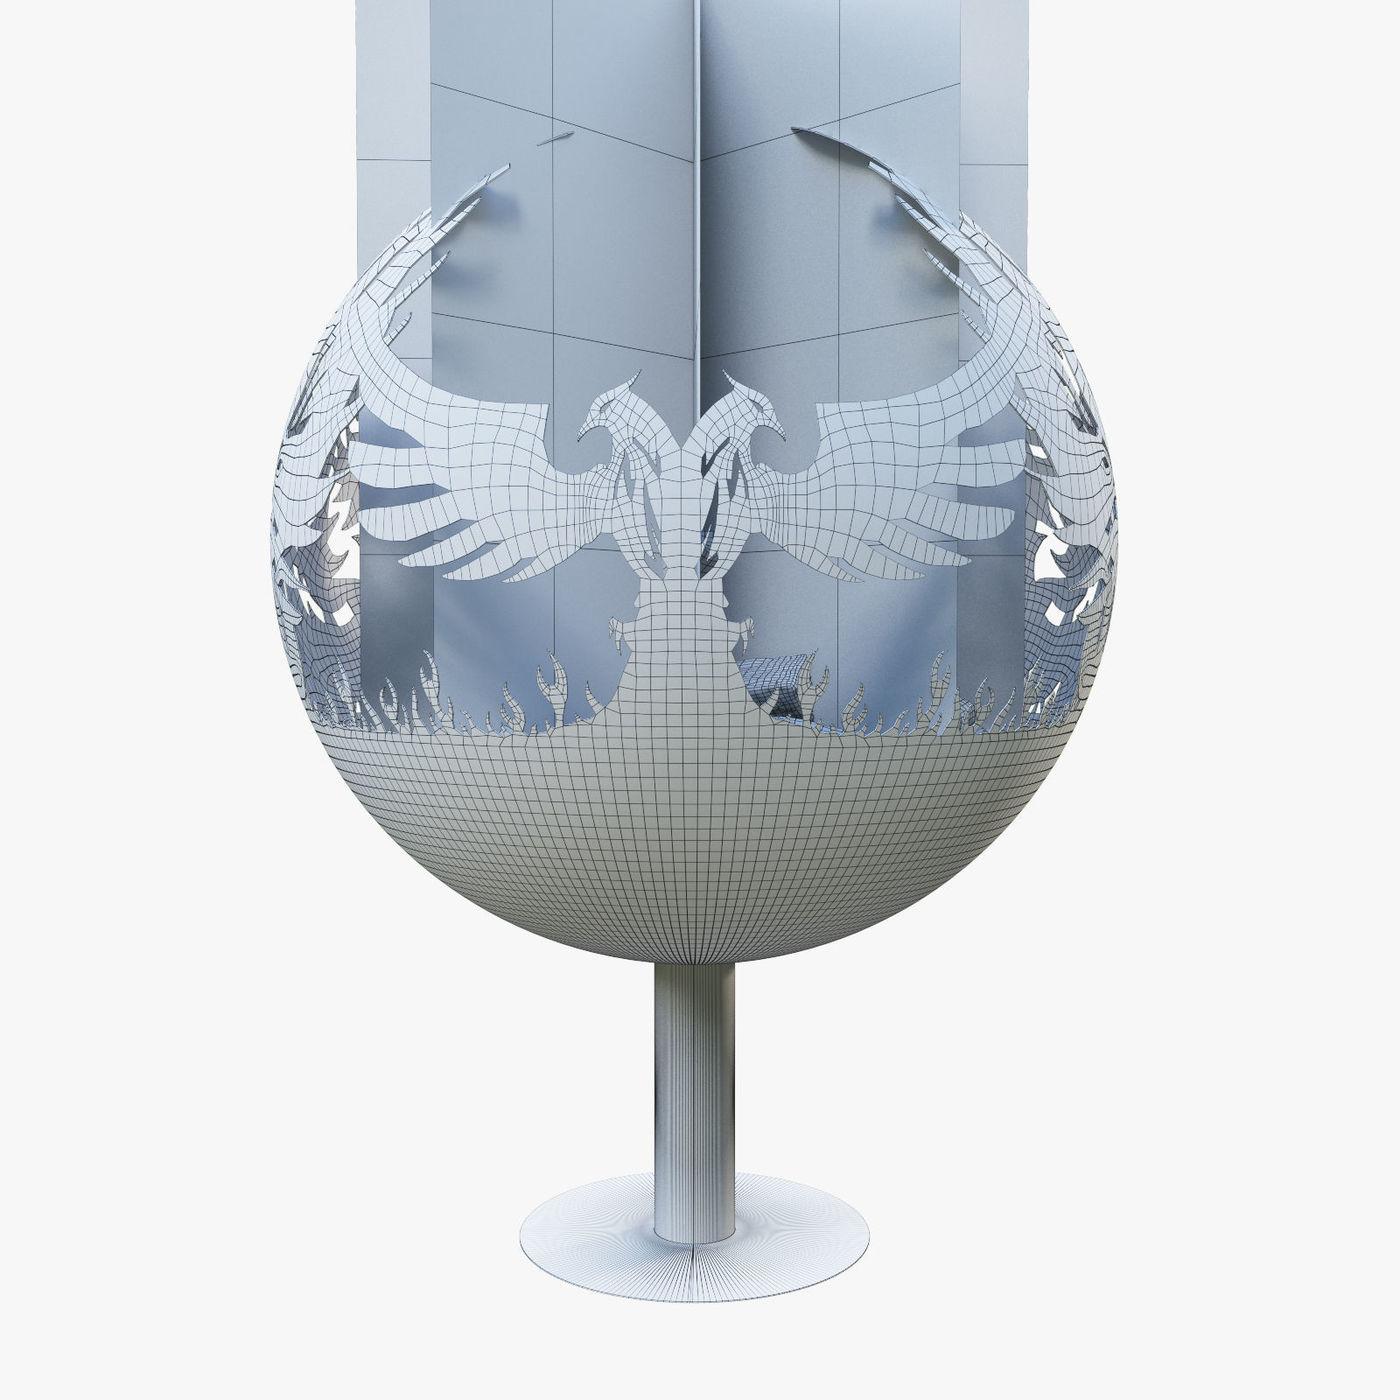 Phoenix fireplace concept